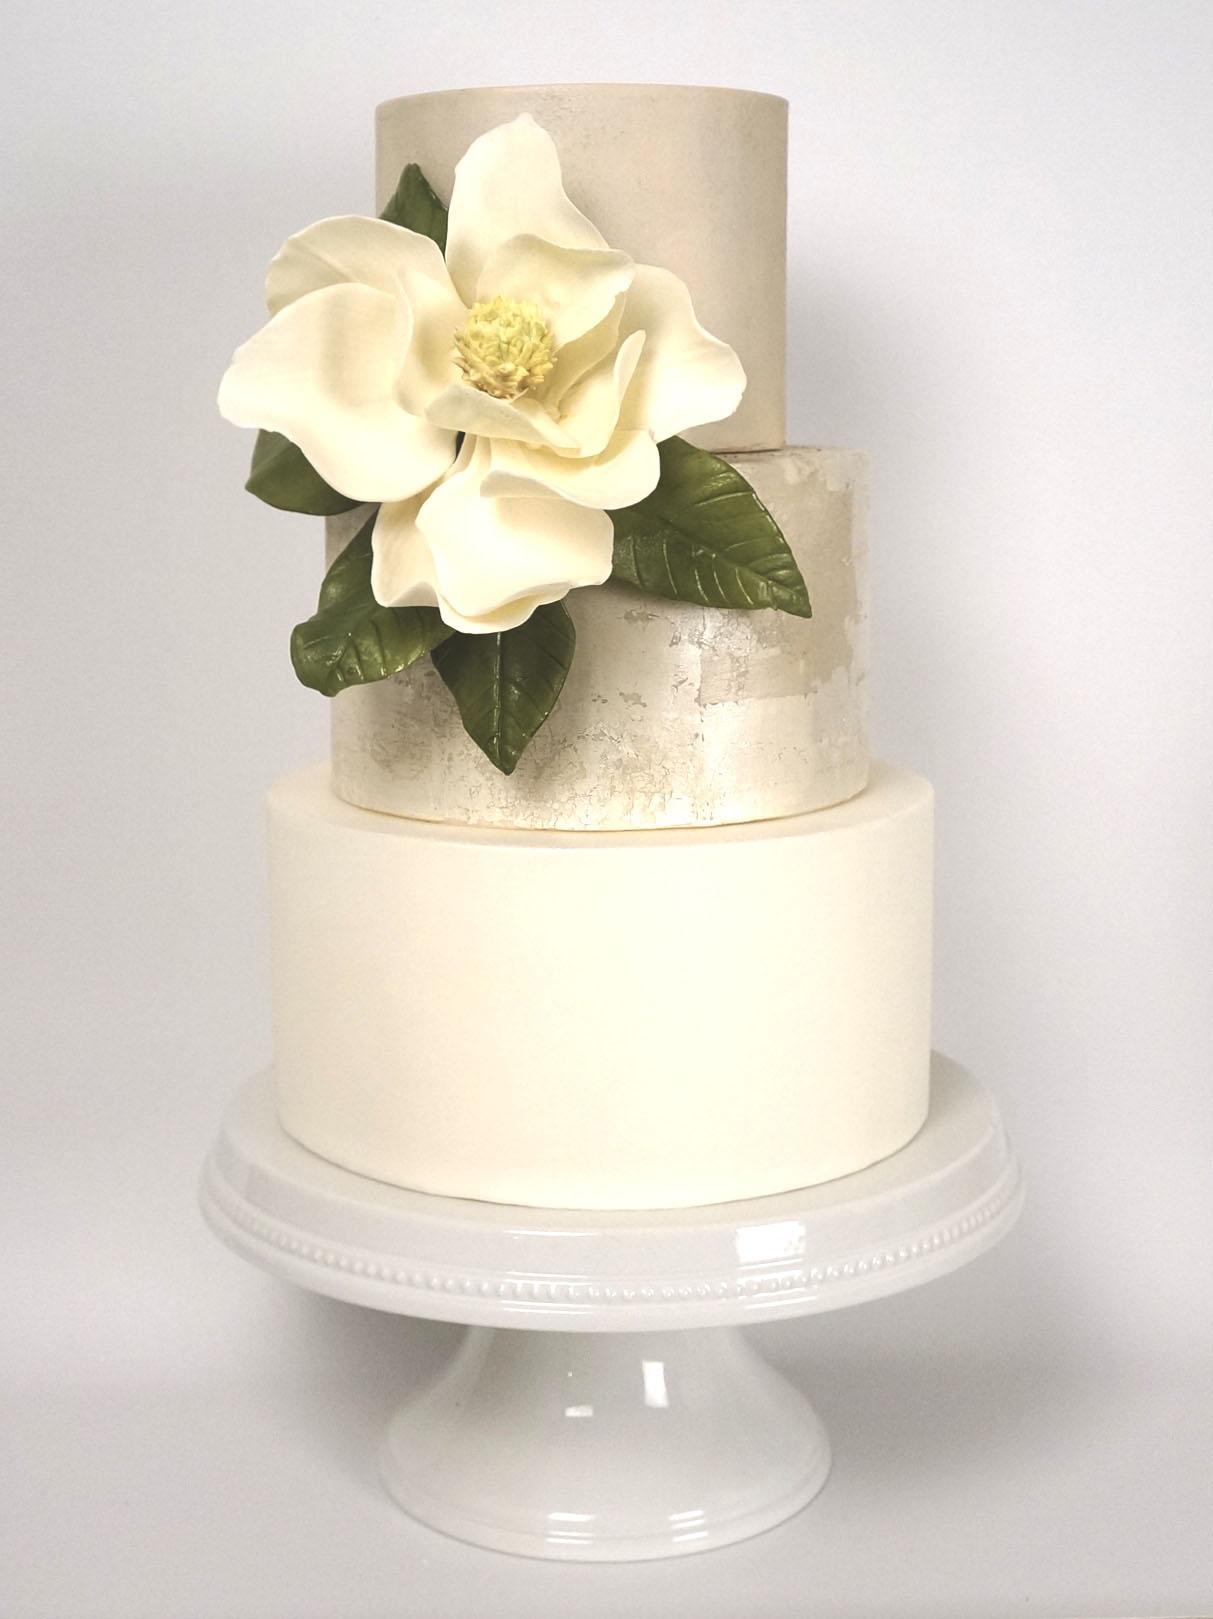 antique-silver-metallic-magnolia-wedding-cake-baltimore-maryland.jpg